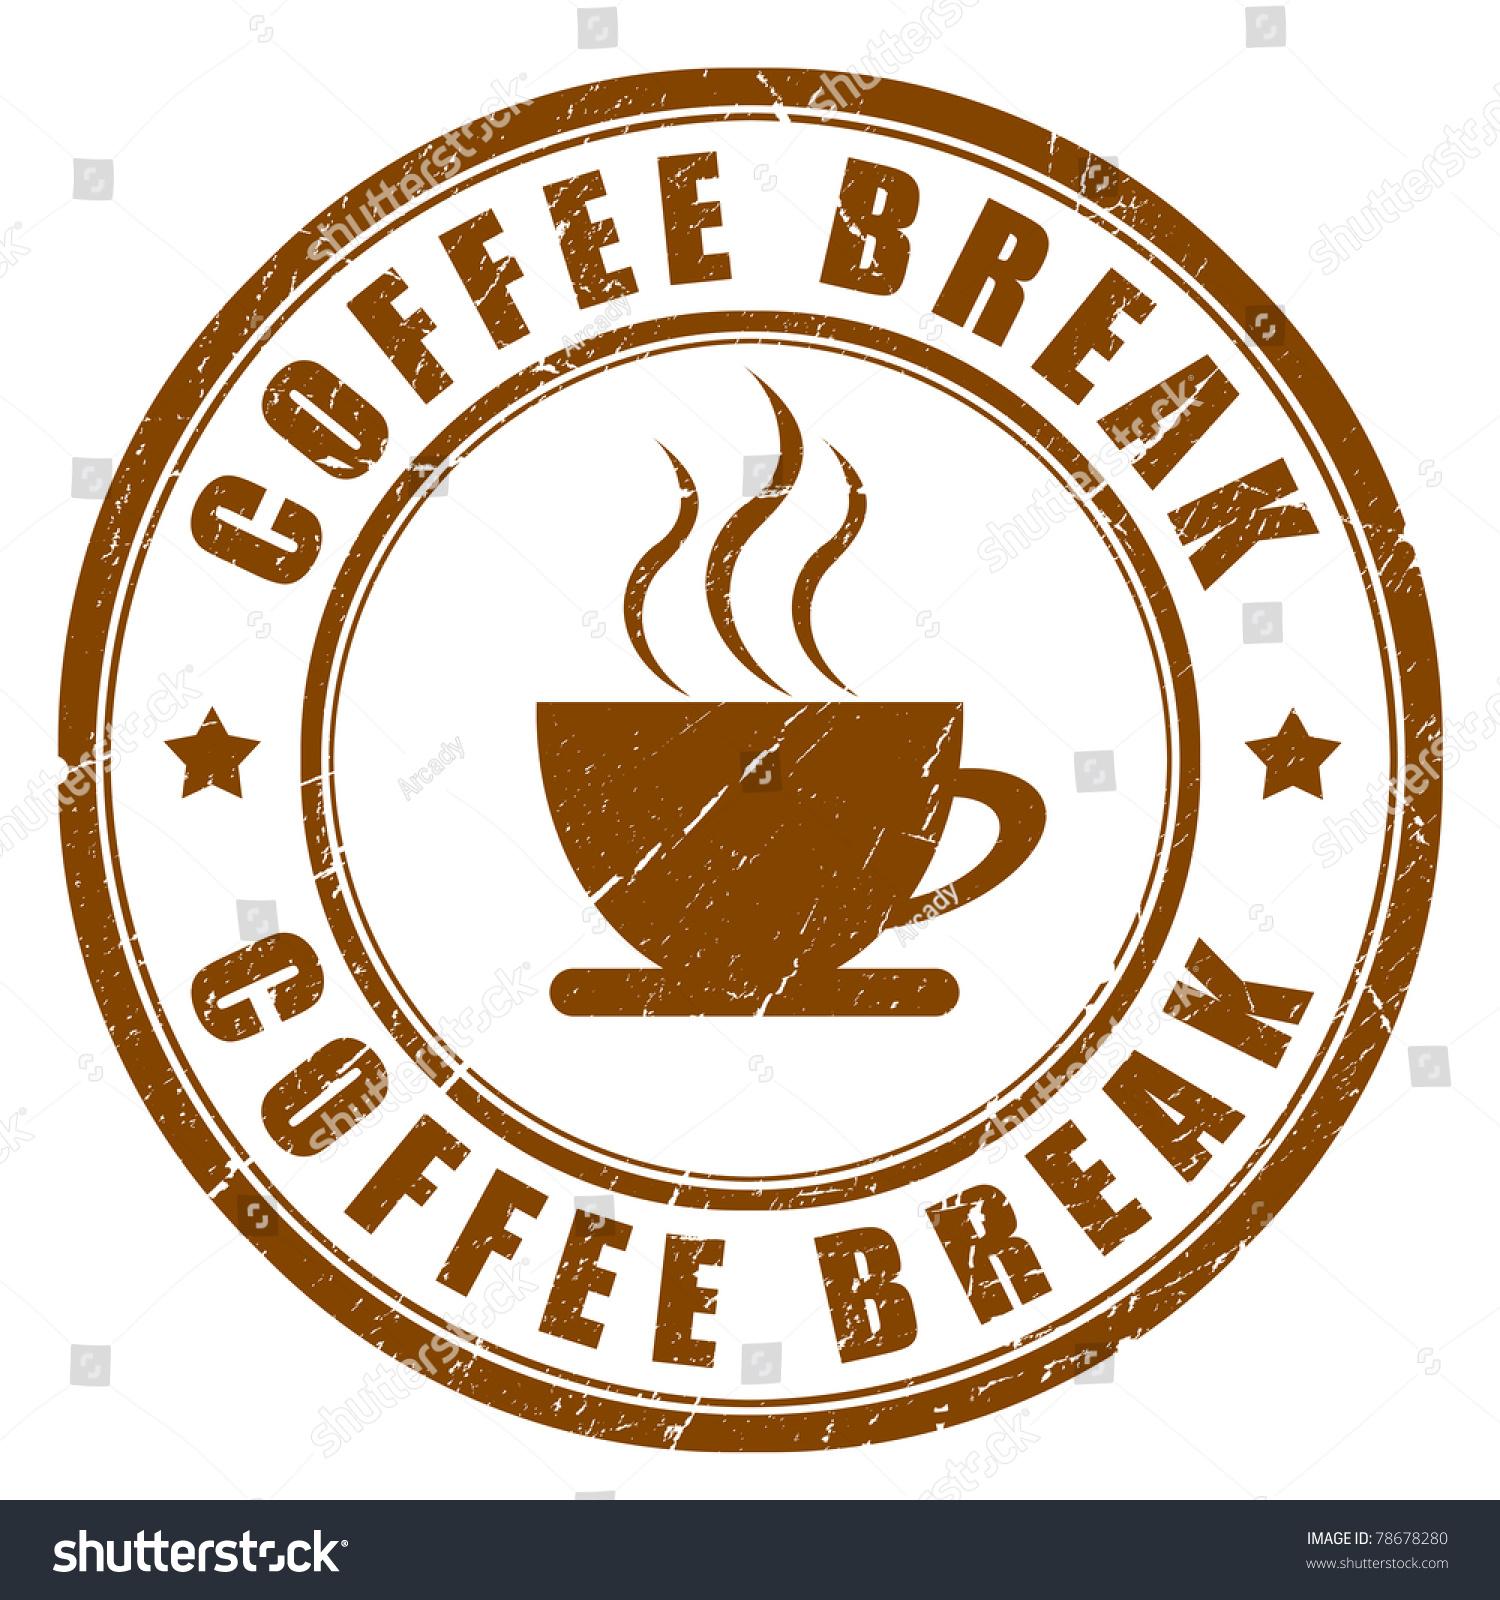 coffee break sign stock illustration 78678280 shutterstock